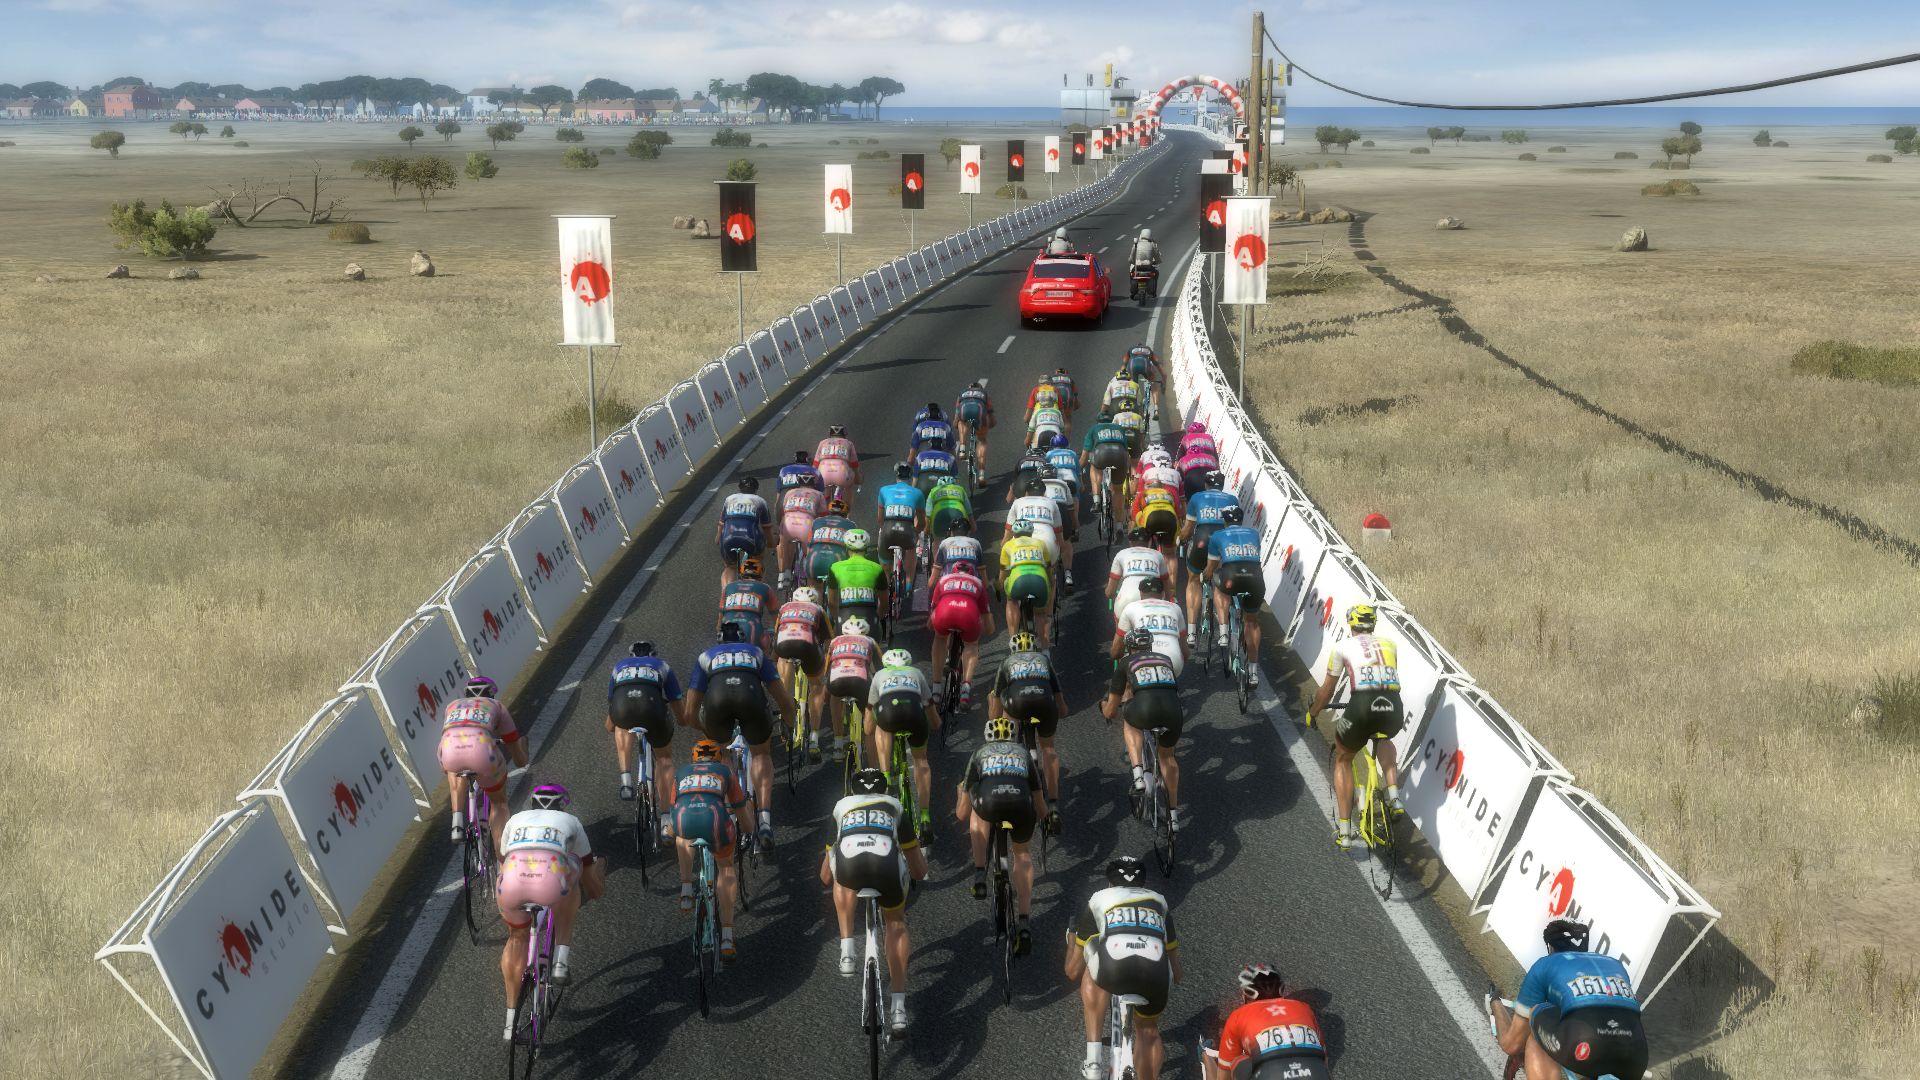 pcmdaily.com/images/mg/2019/Races/PT/Qatar/mg19_qat_s03_11.jpg